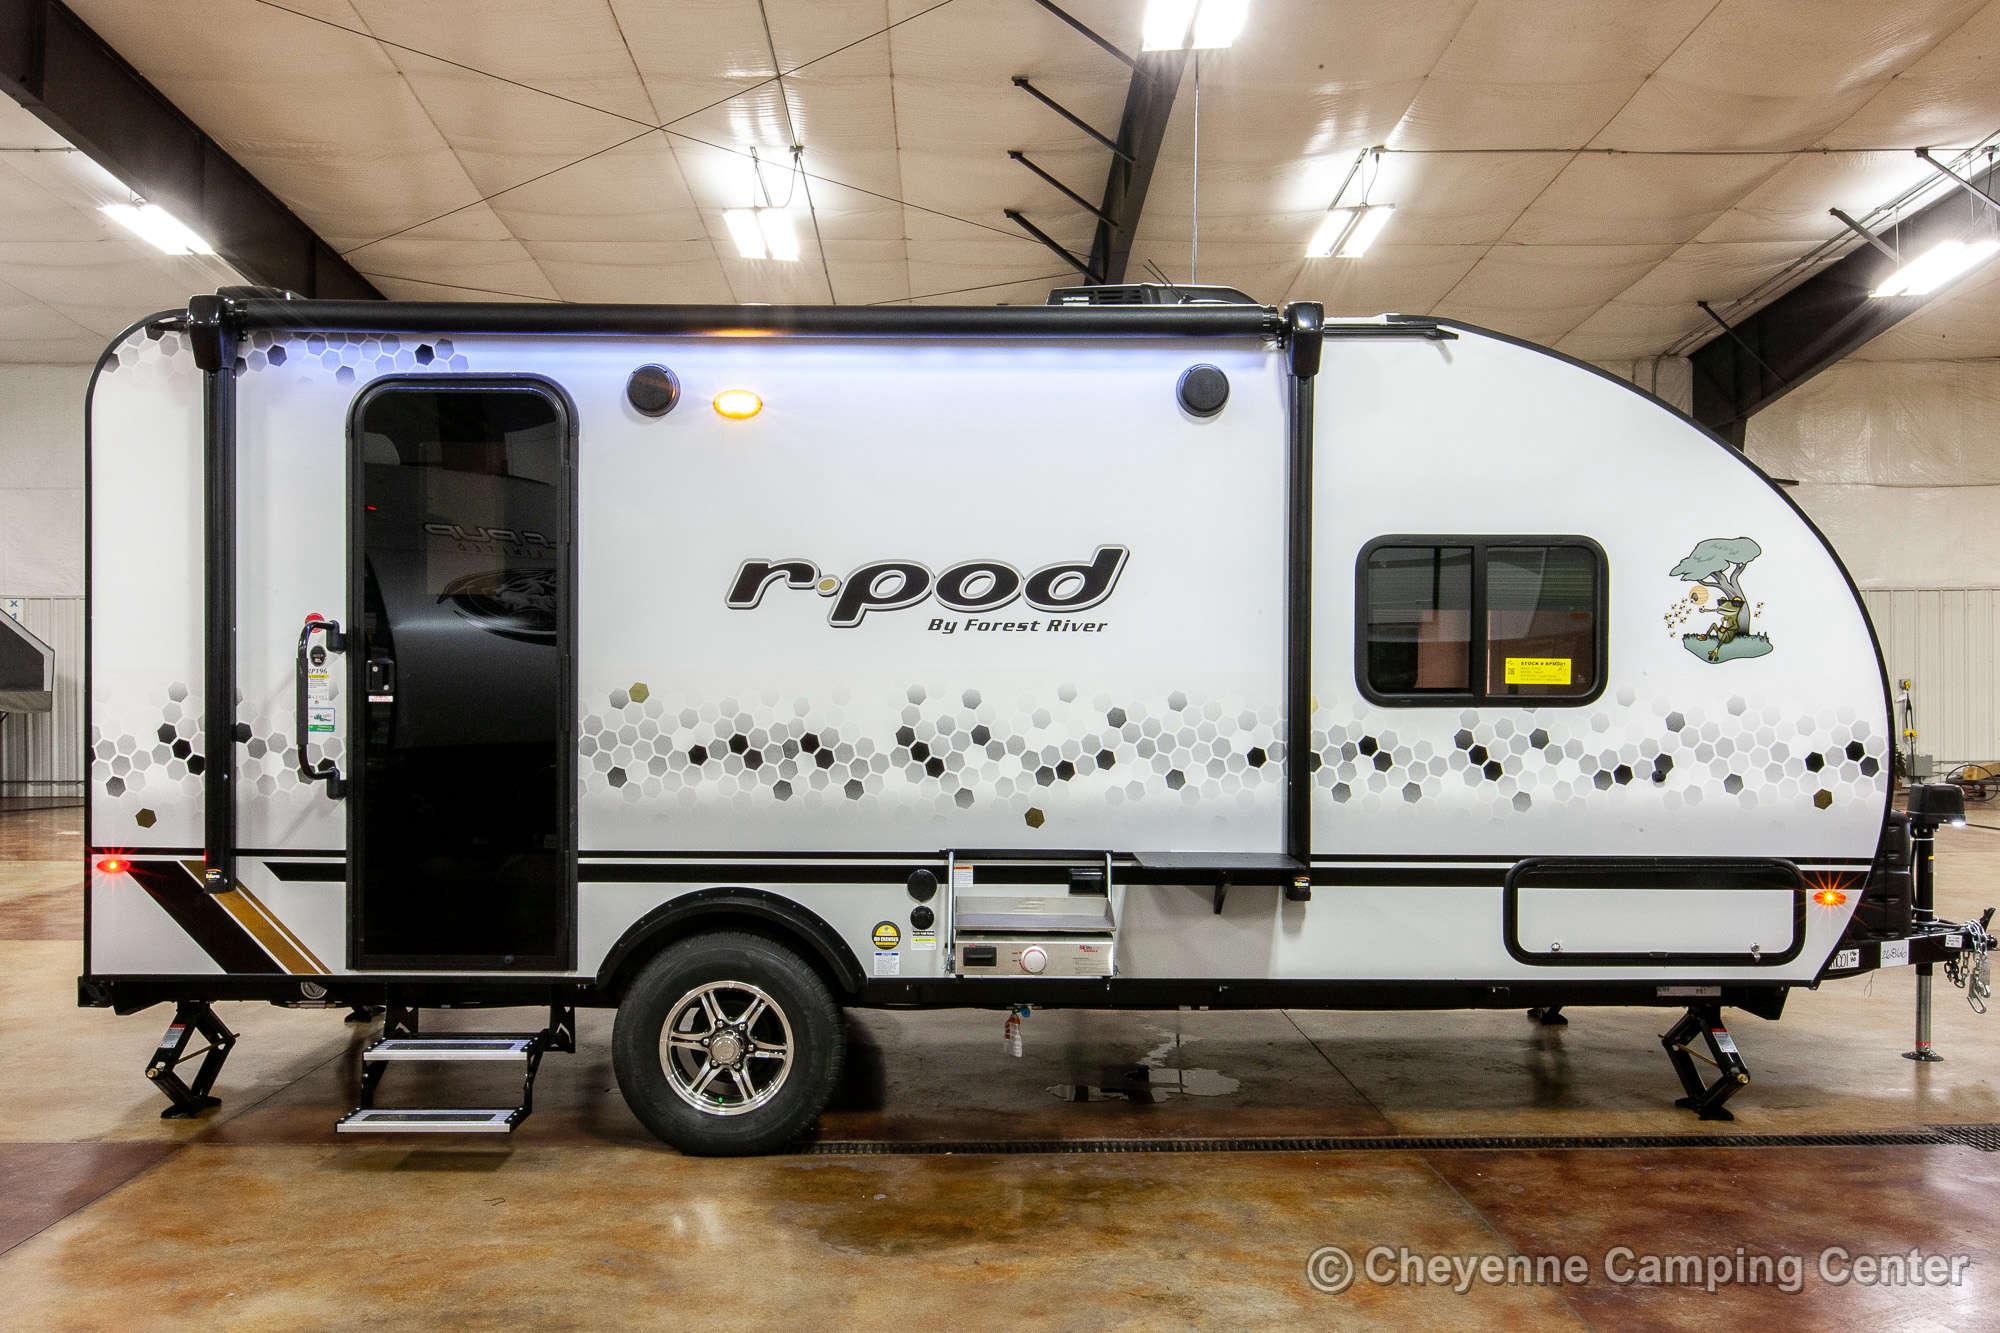 2021 Forest River R-POD RP-196 Travel Trailer Exterior Image